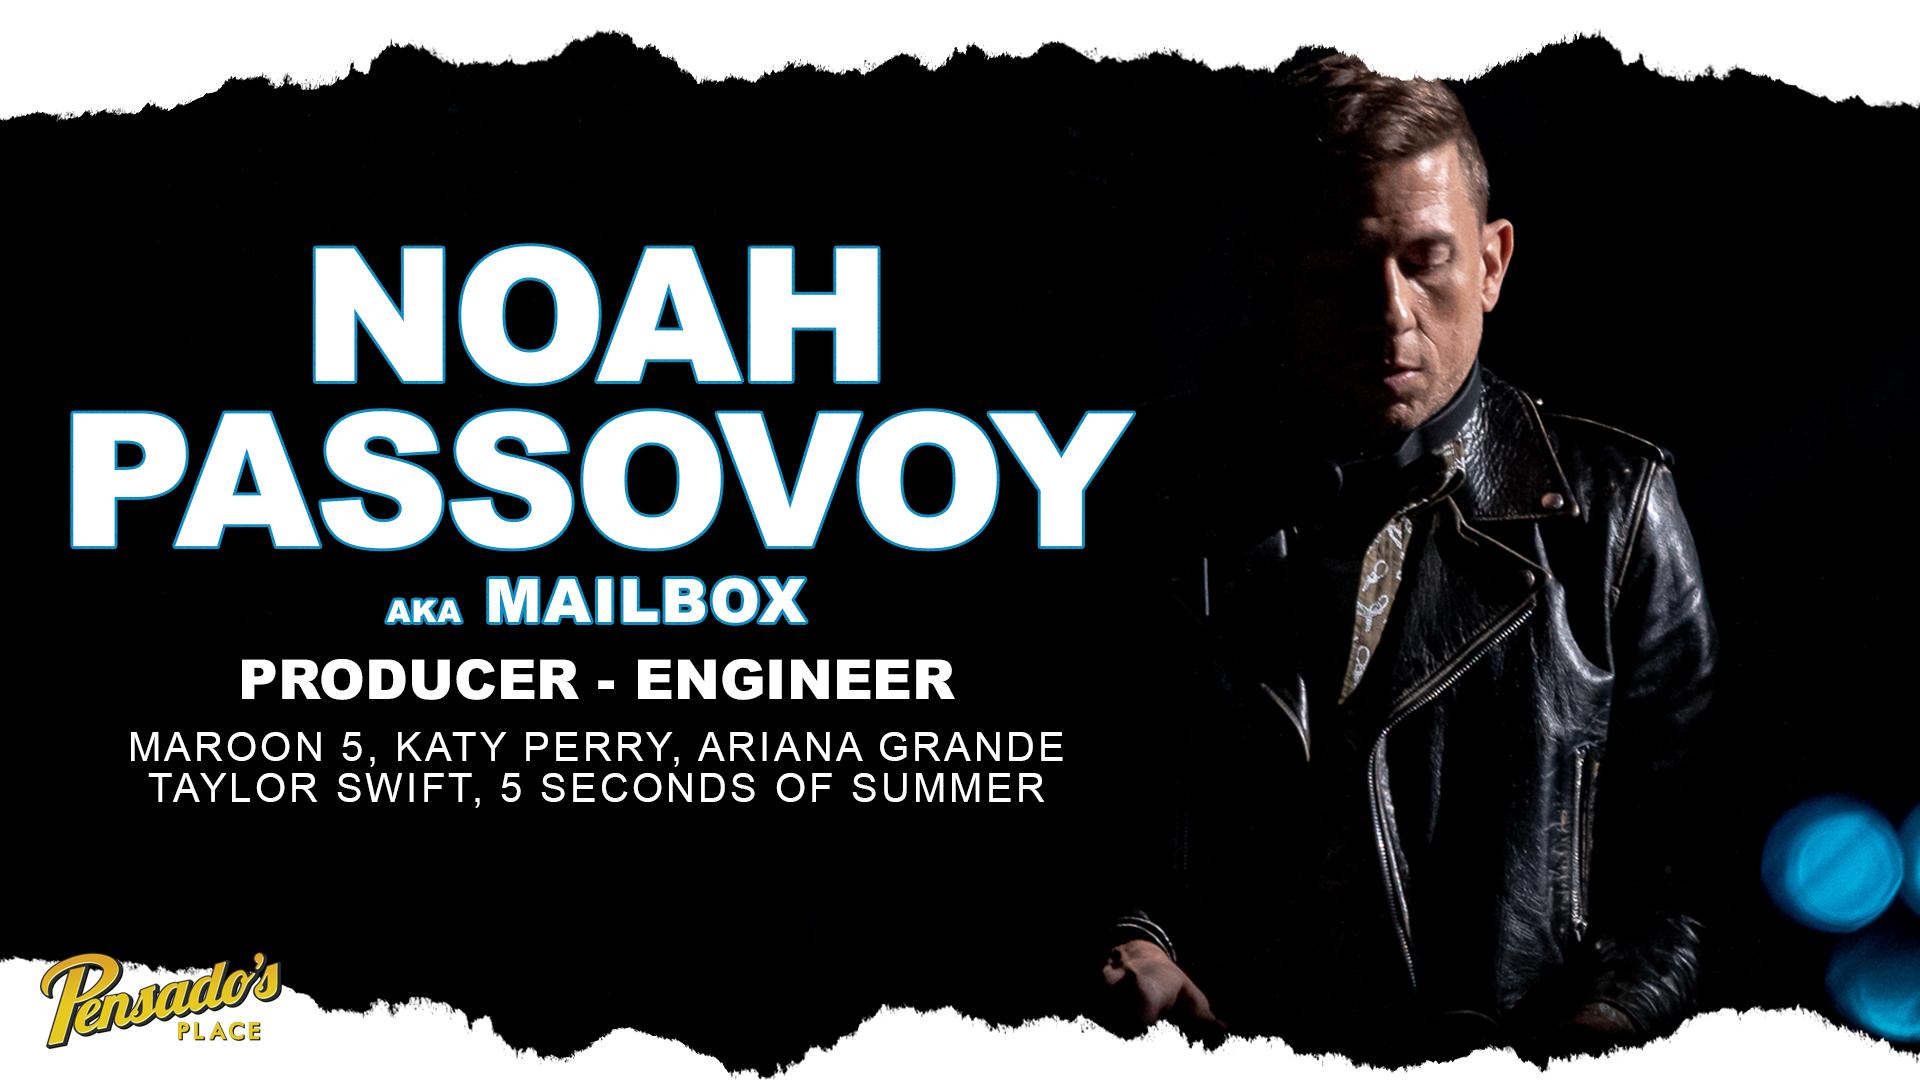 Maroon 5 Producer / Engineer, Noah Passovoy